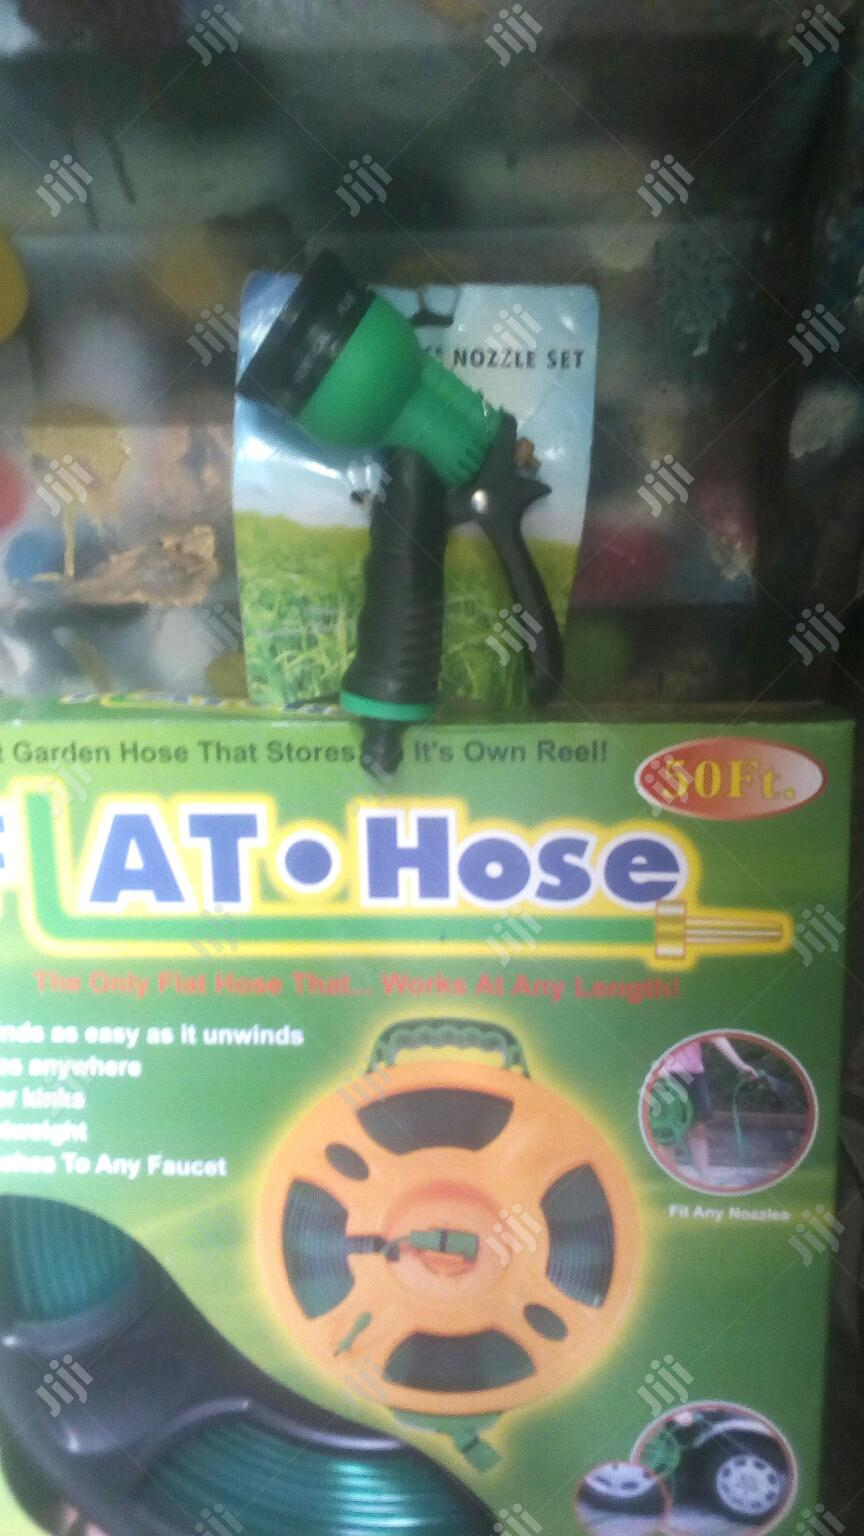 New Flat Garden Watering Hose And Sprinkler.